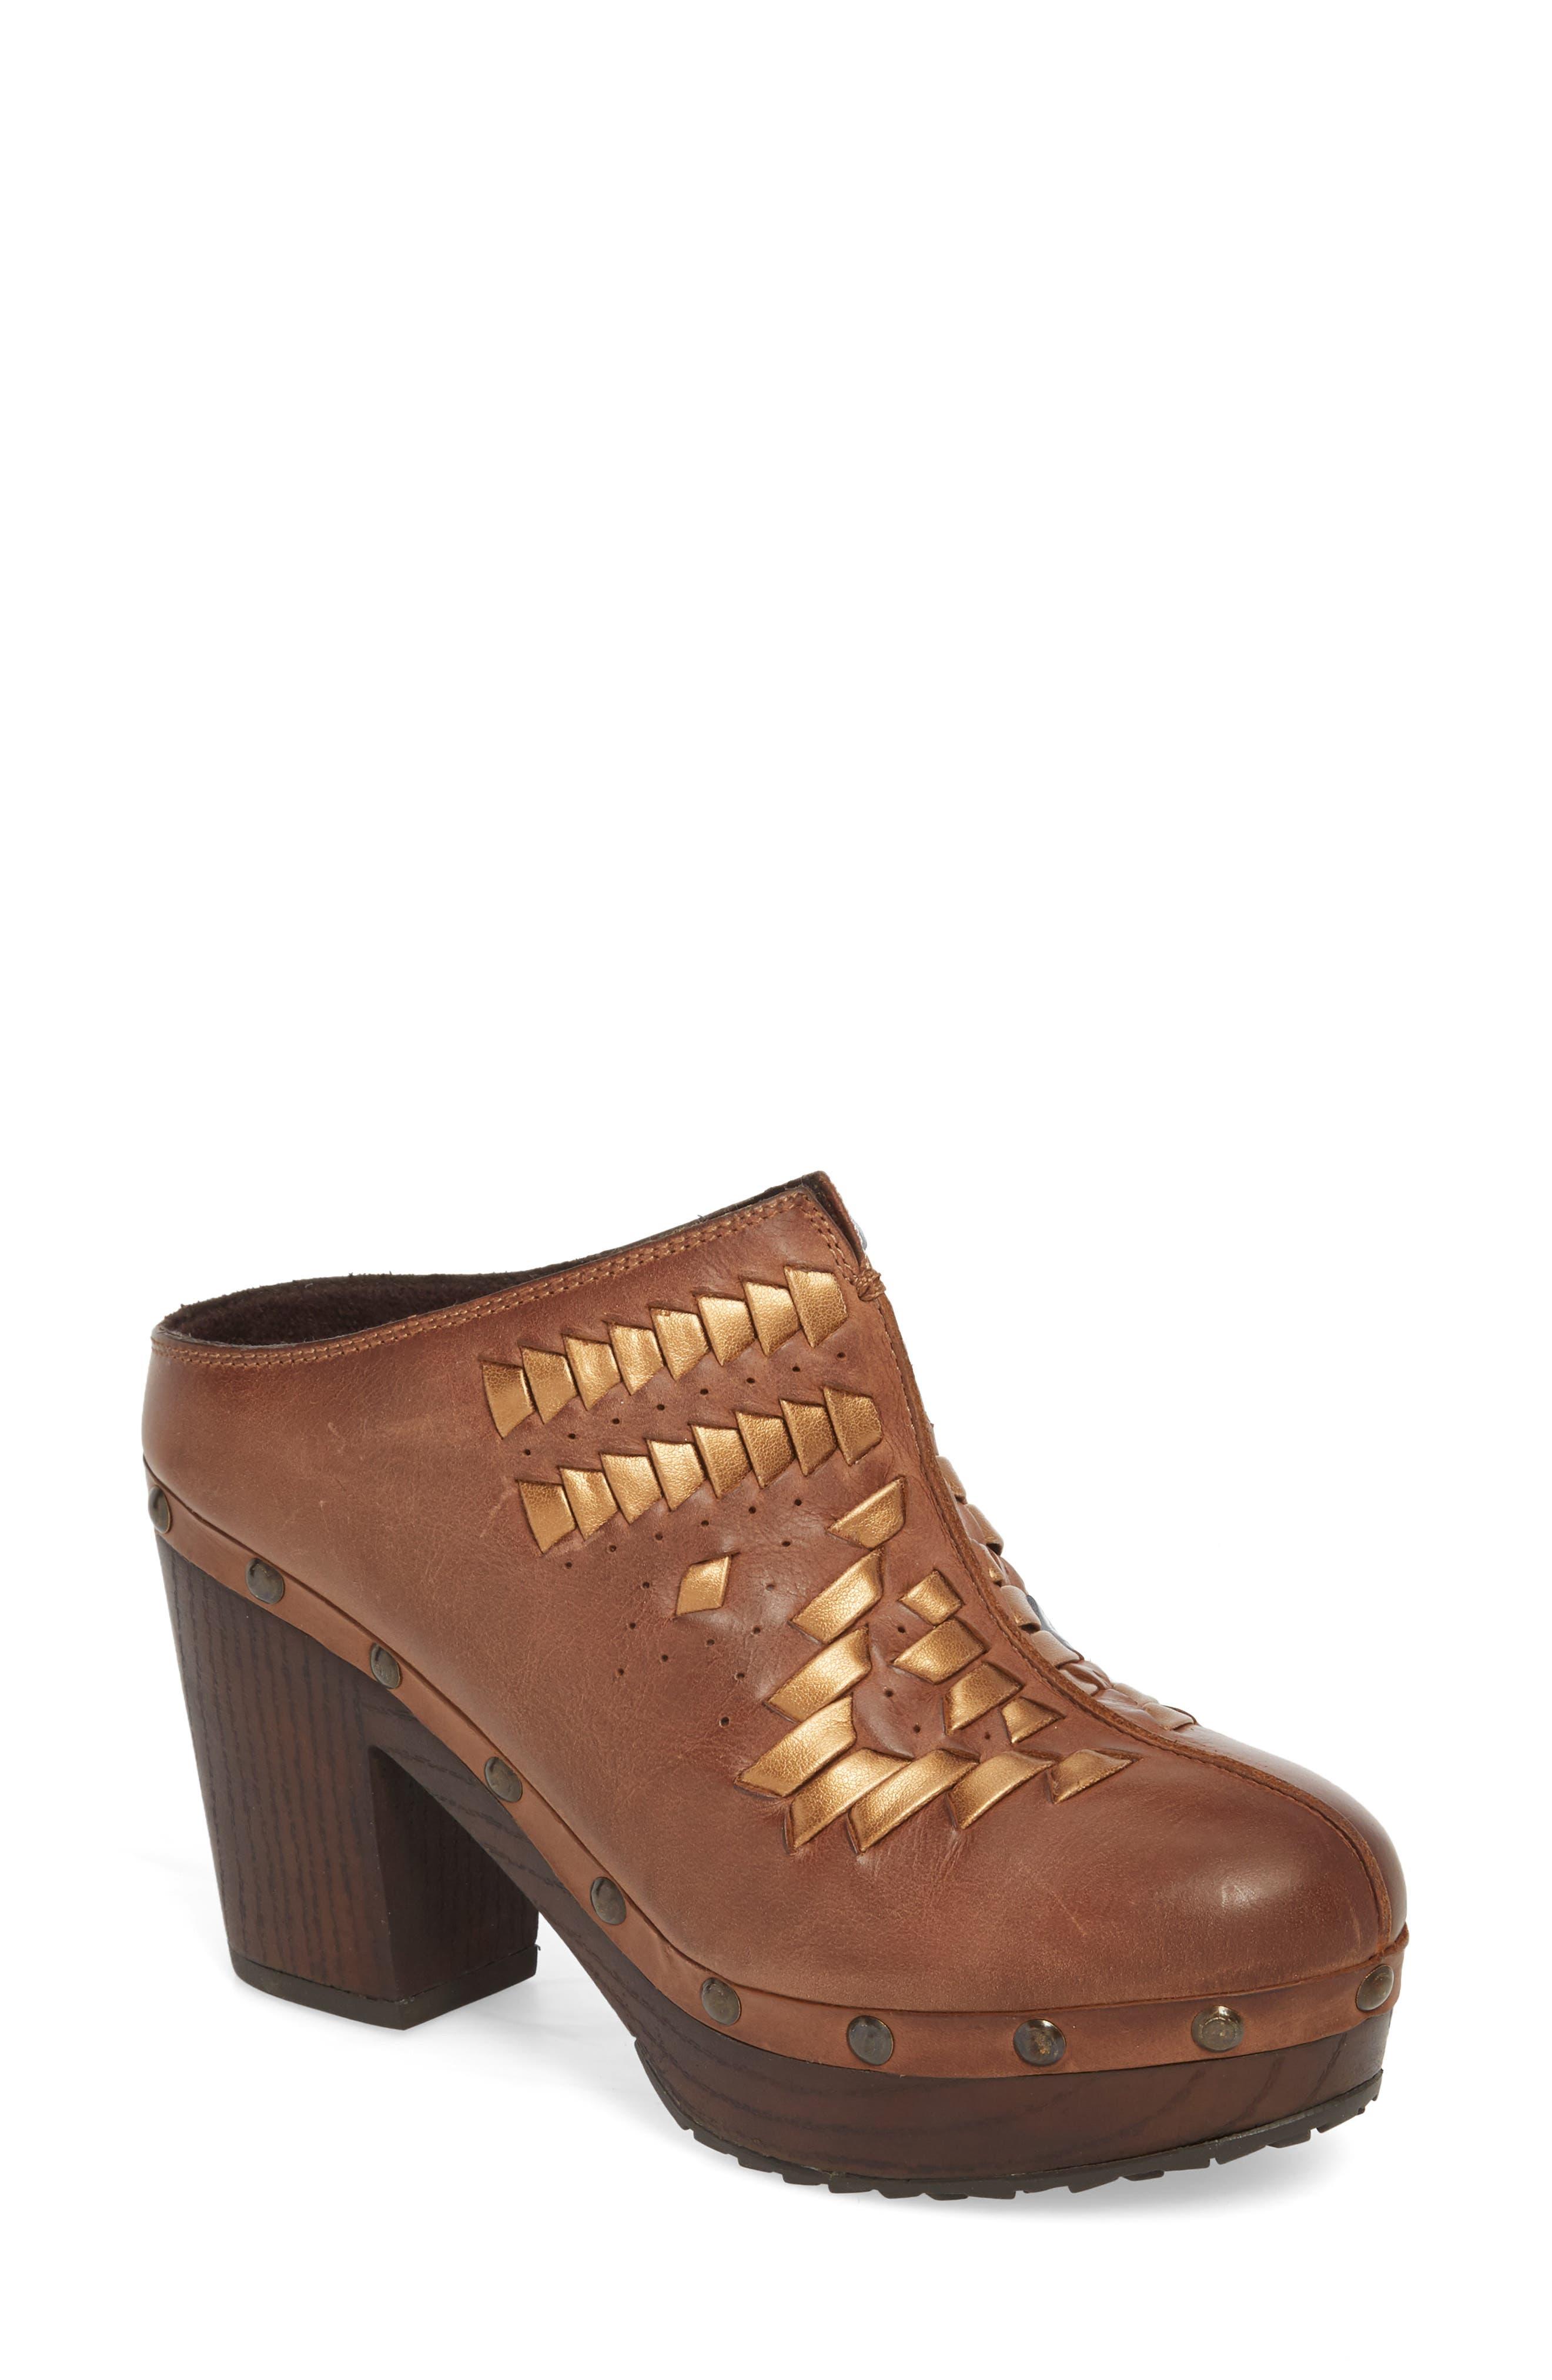 ARIAT Bria Platform Clog in Bronzed Brown Leather